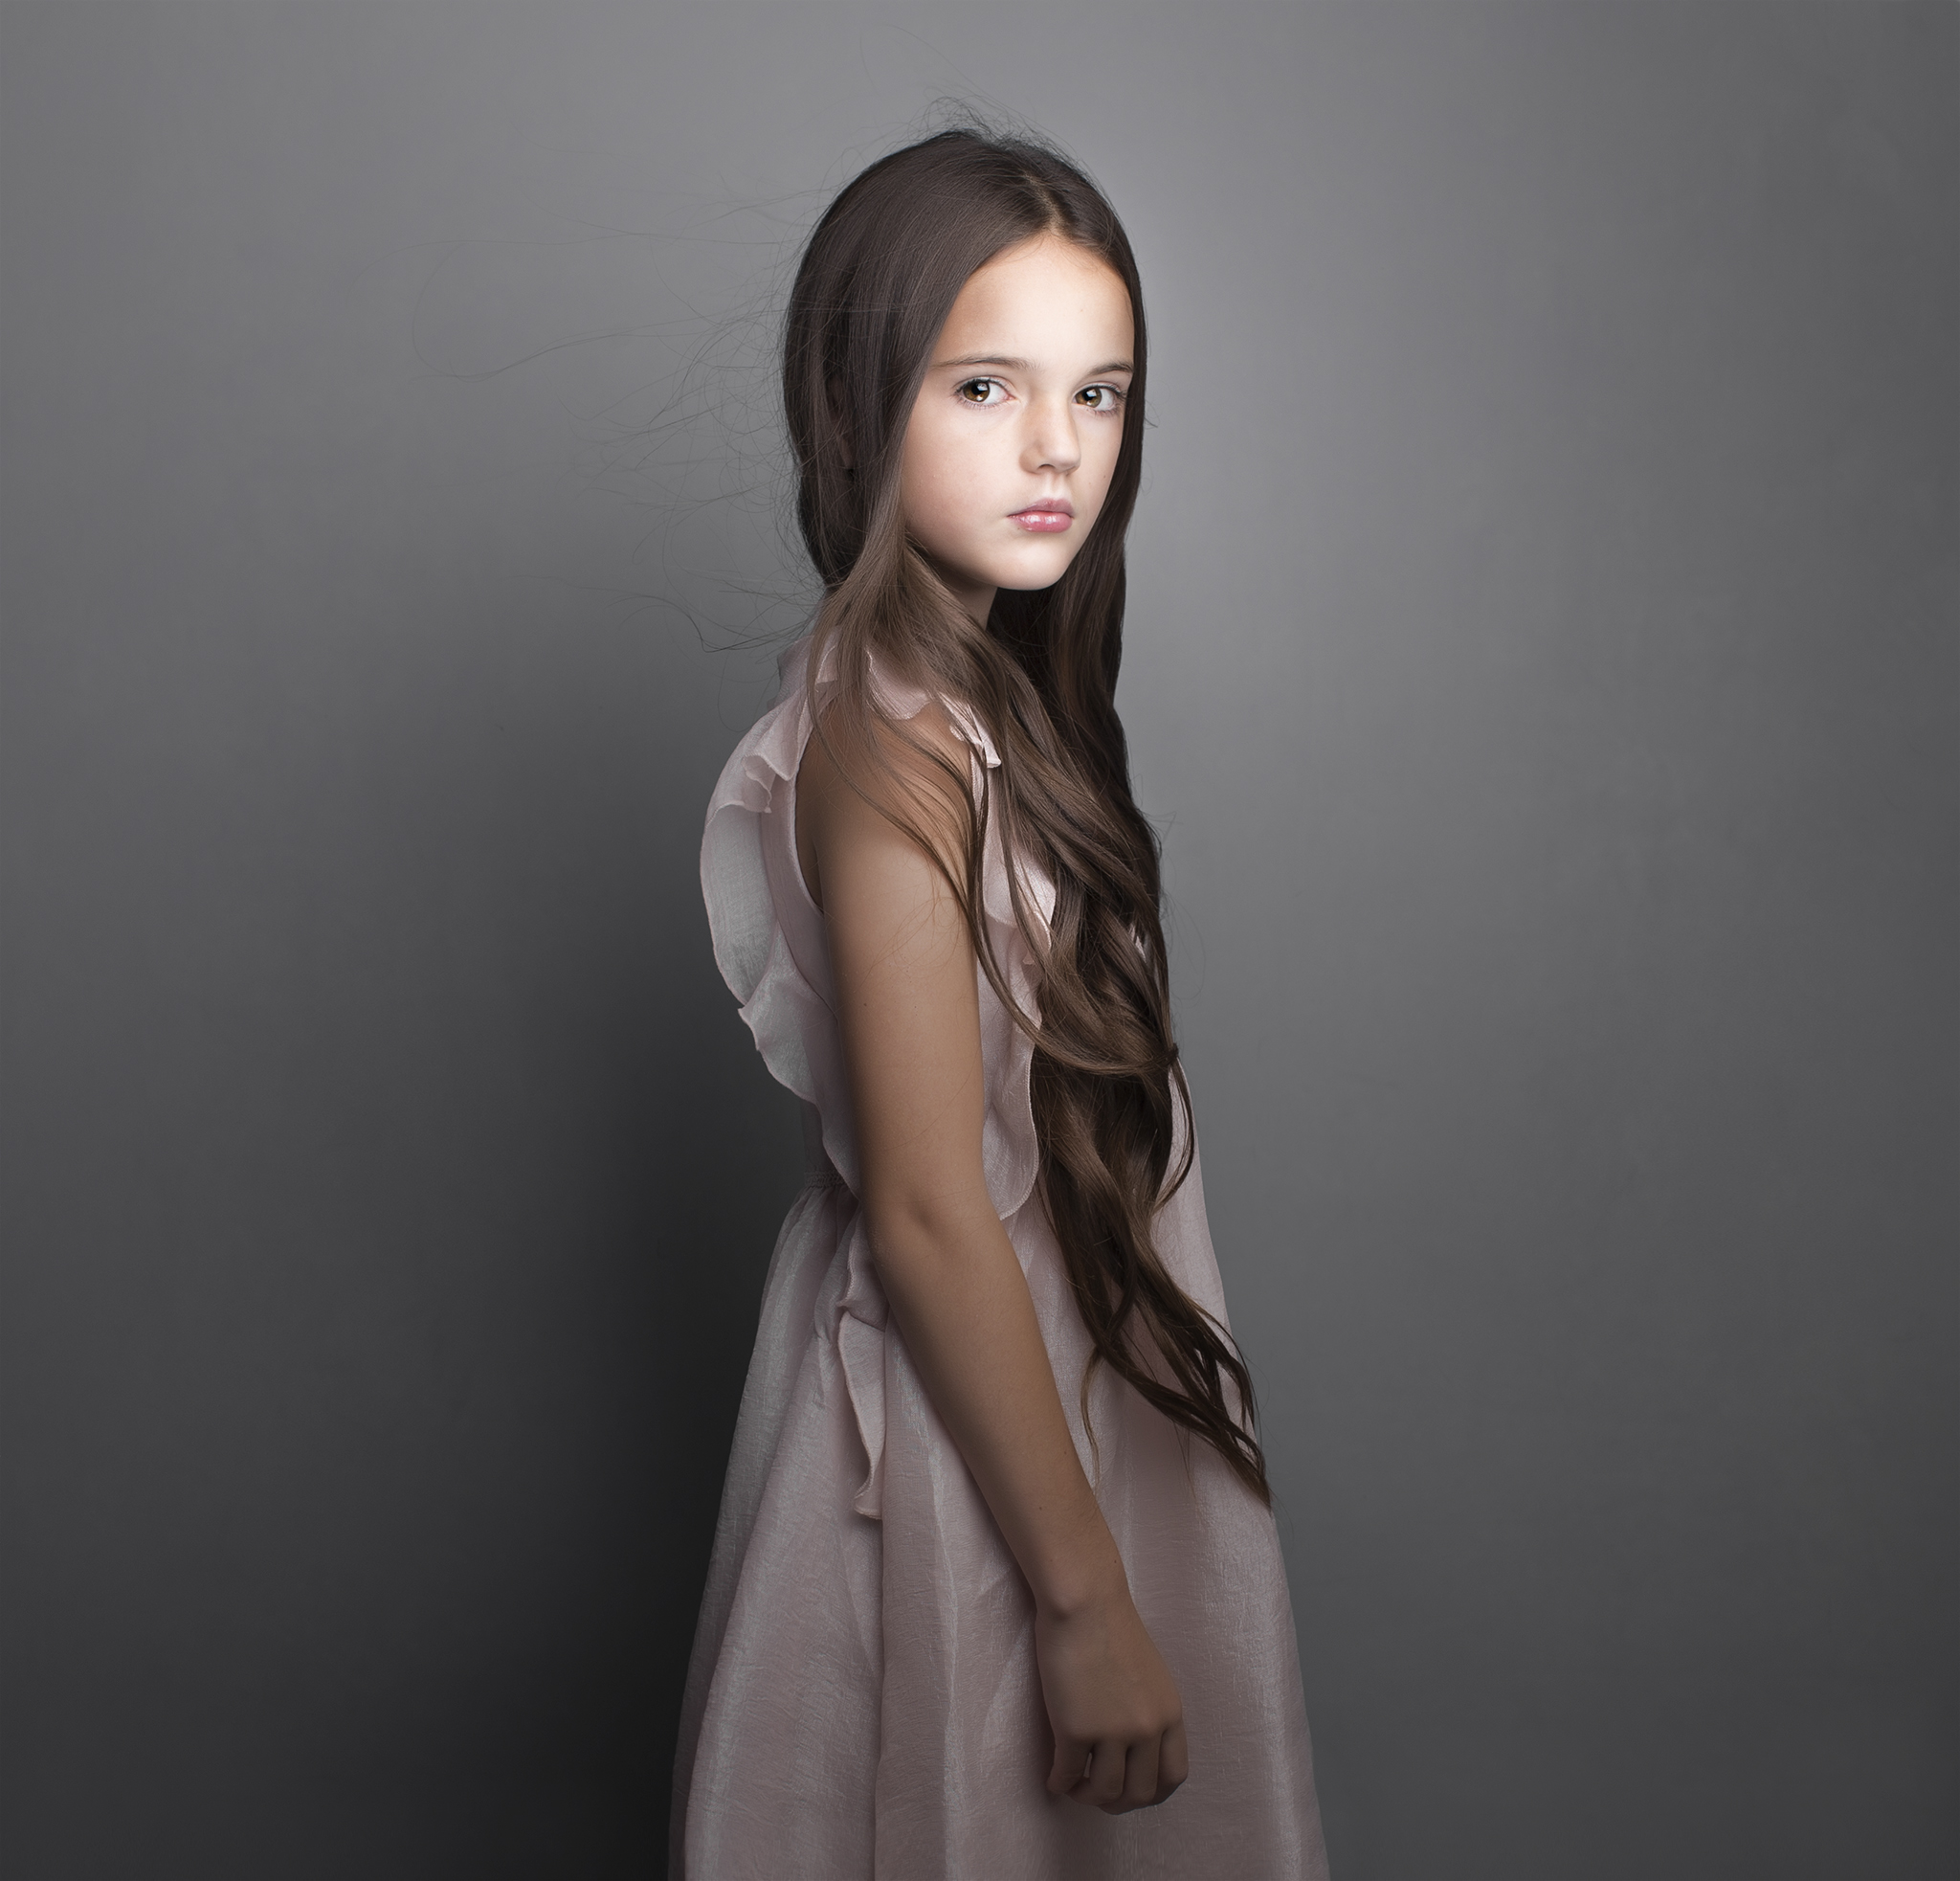 elizabethgfineartphotography_kingslangley_model_ava_3.jpg